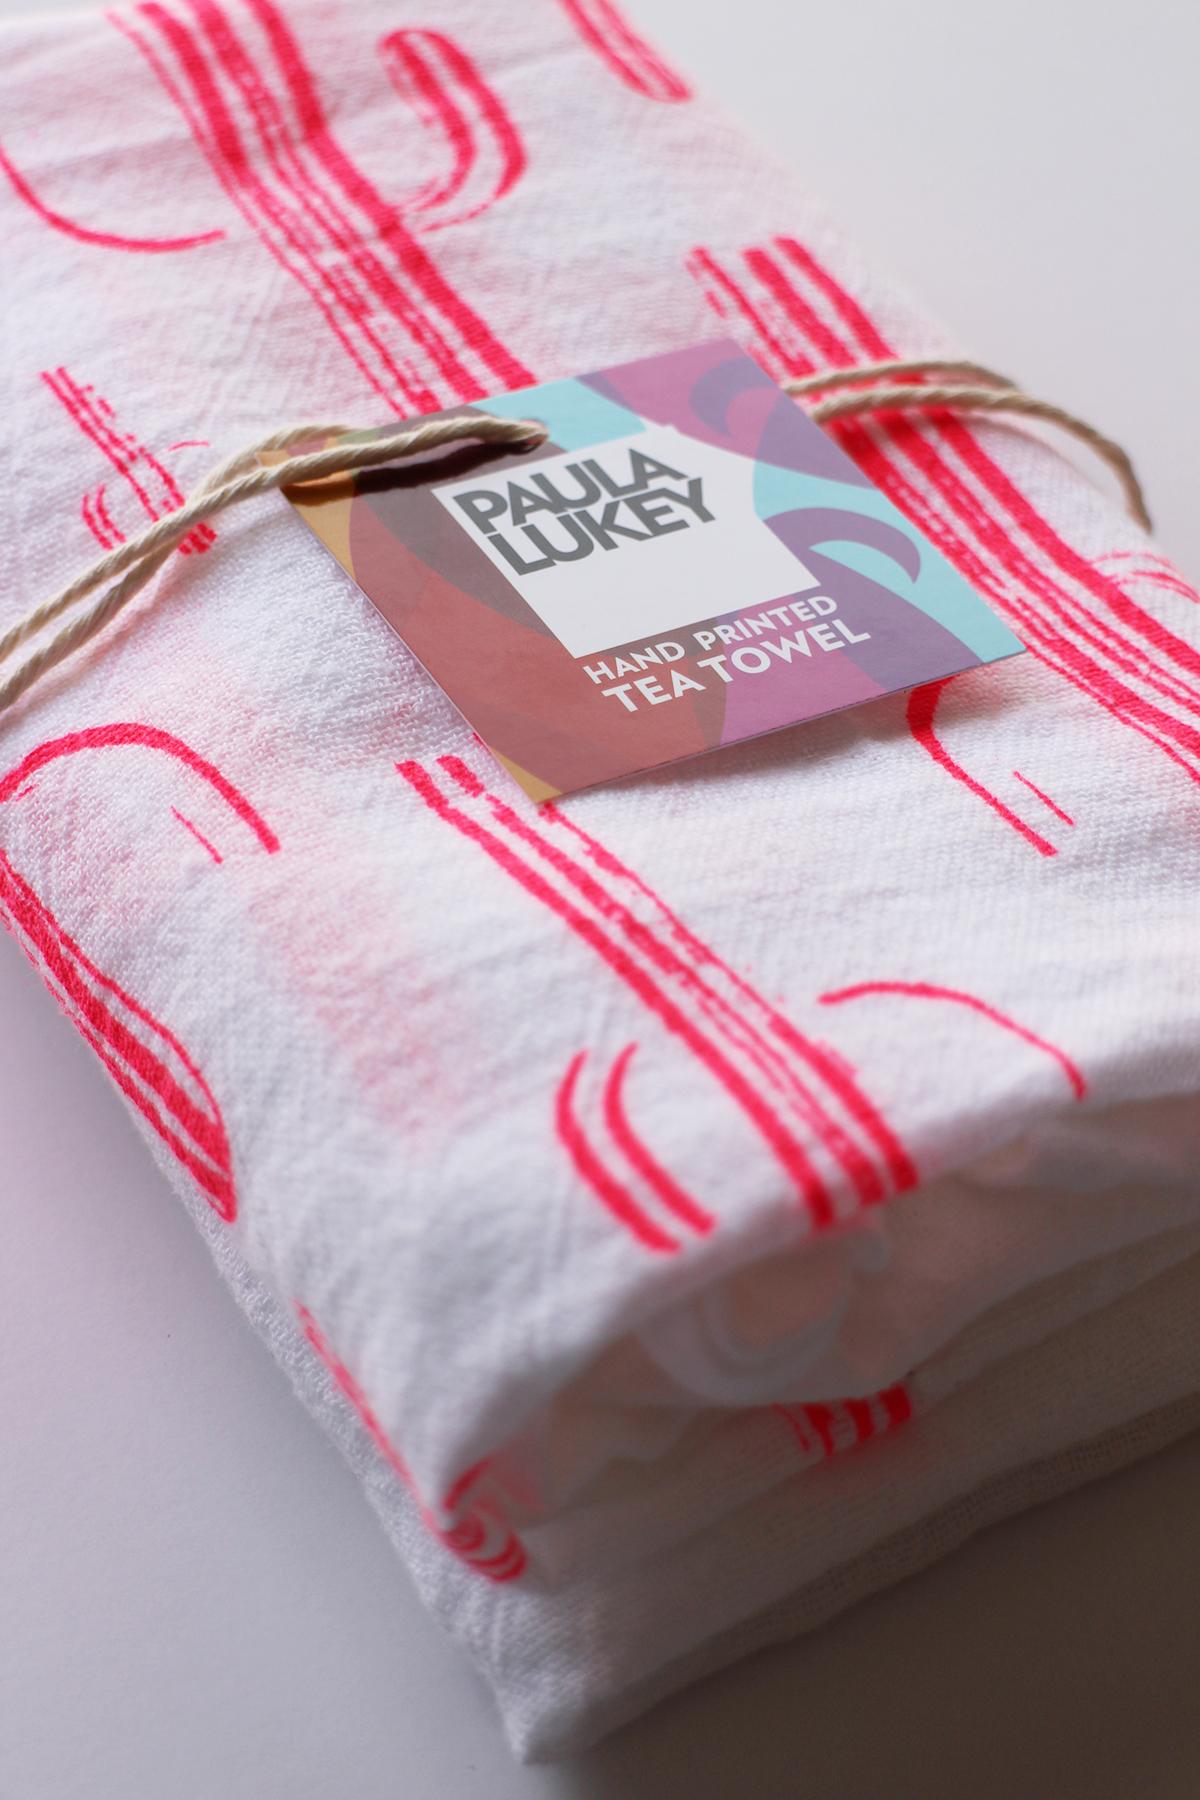 My new Saguaro Cactus Tea Towel. So Pink, so FUN!